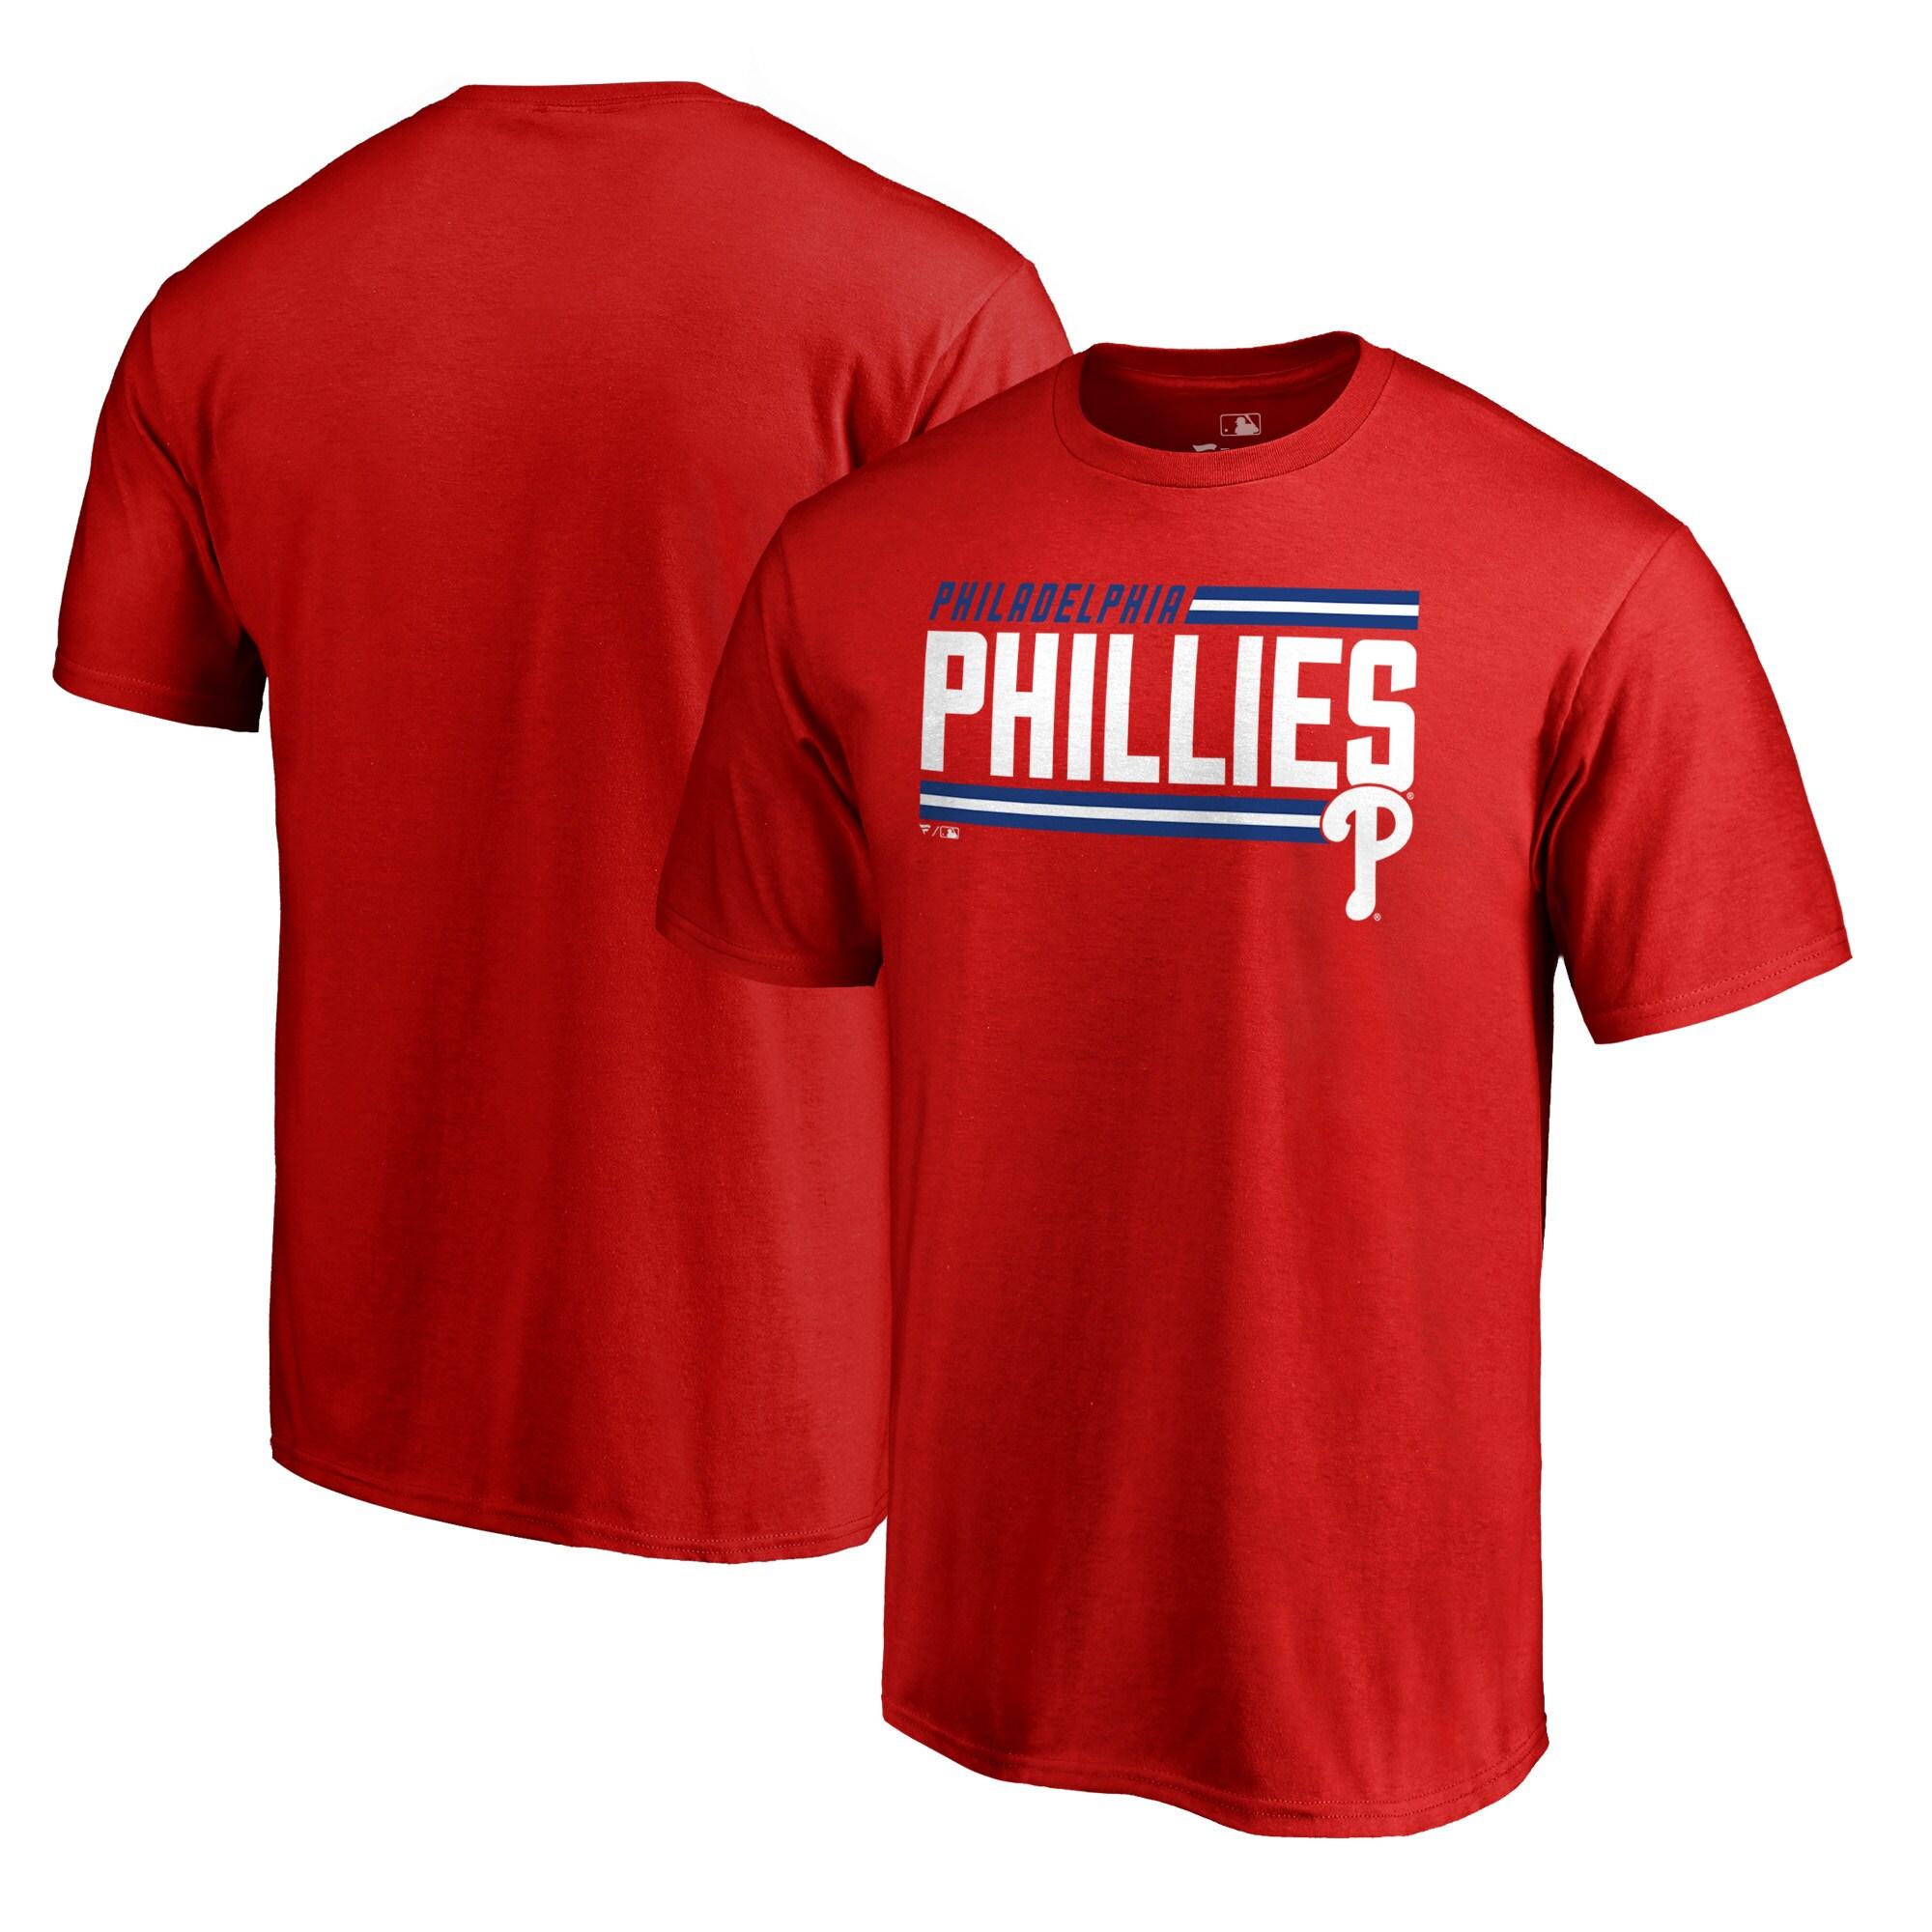 Philadelphia Phillies Fanatics Branded Onside Stripe Big & Tall T-Shirt - Red